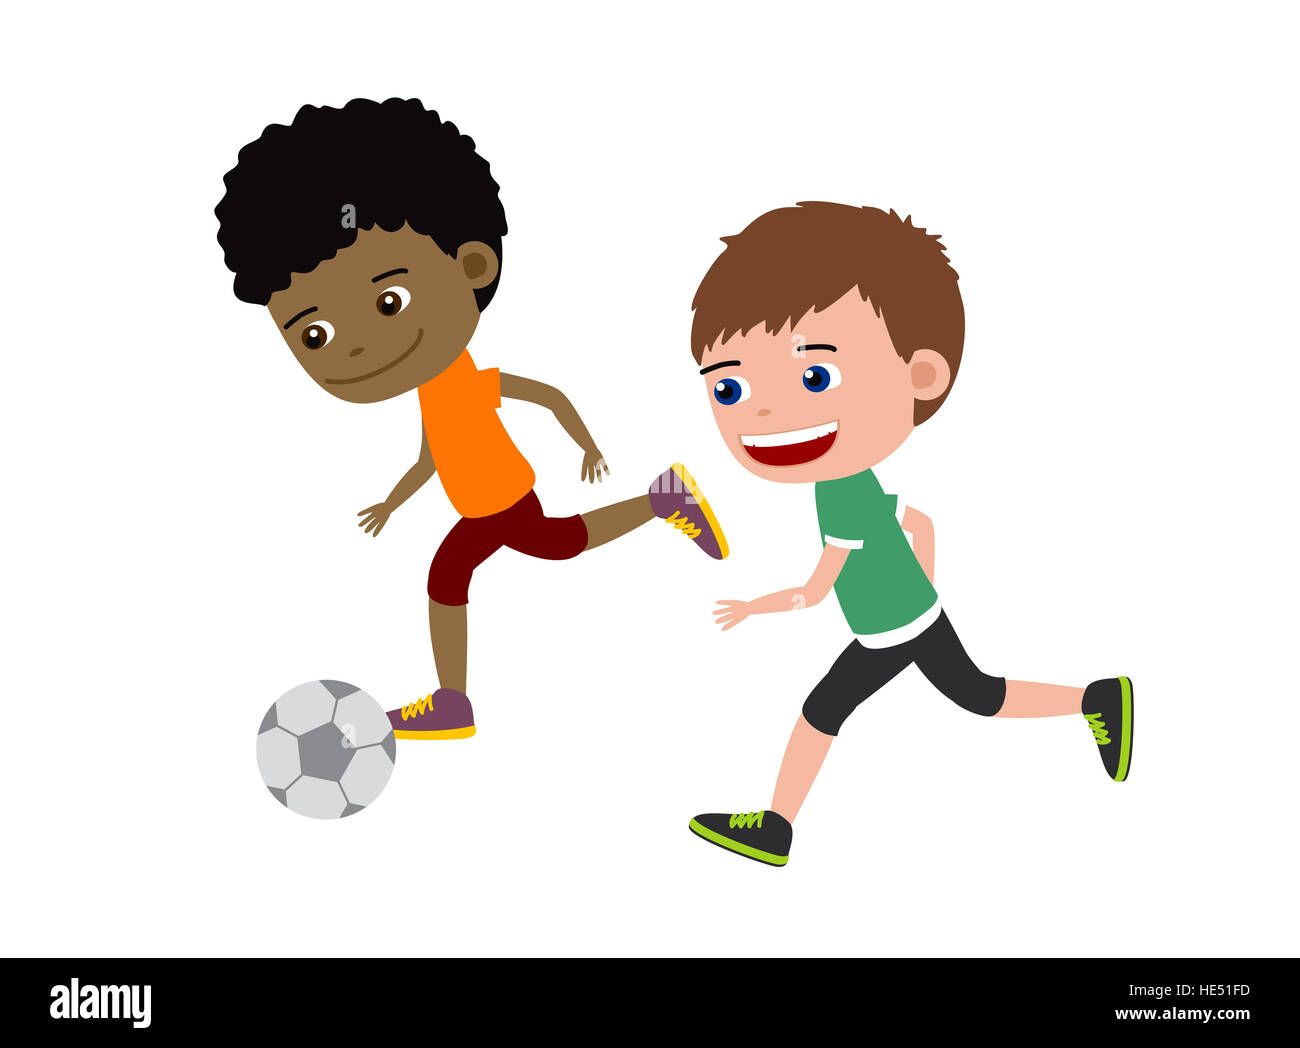 Football Boys Cartoon Illustration Of Two Kids Playing